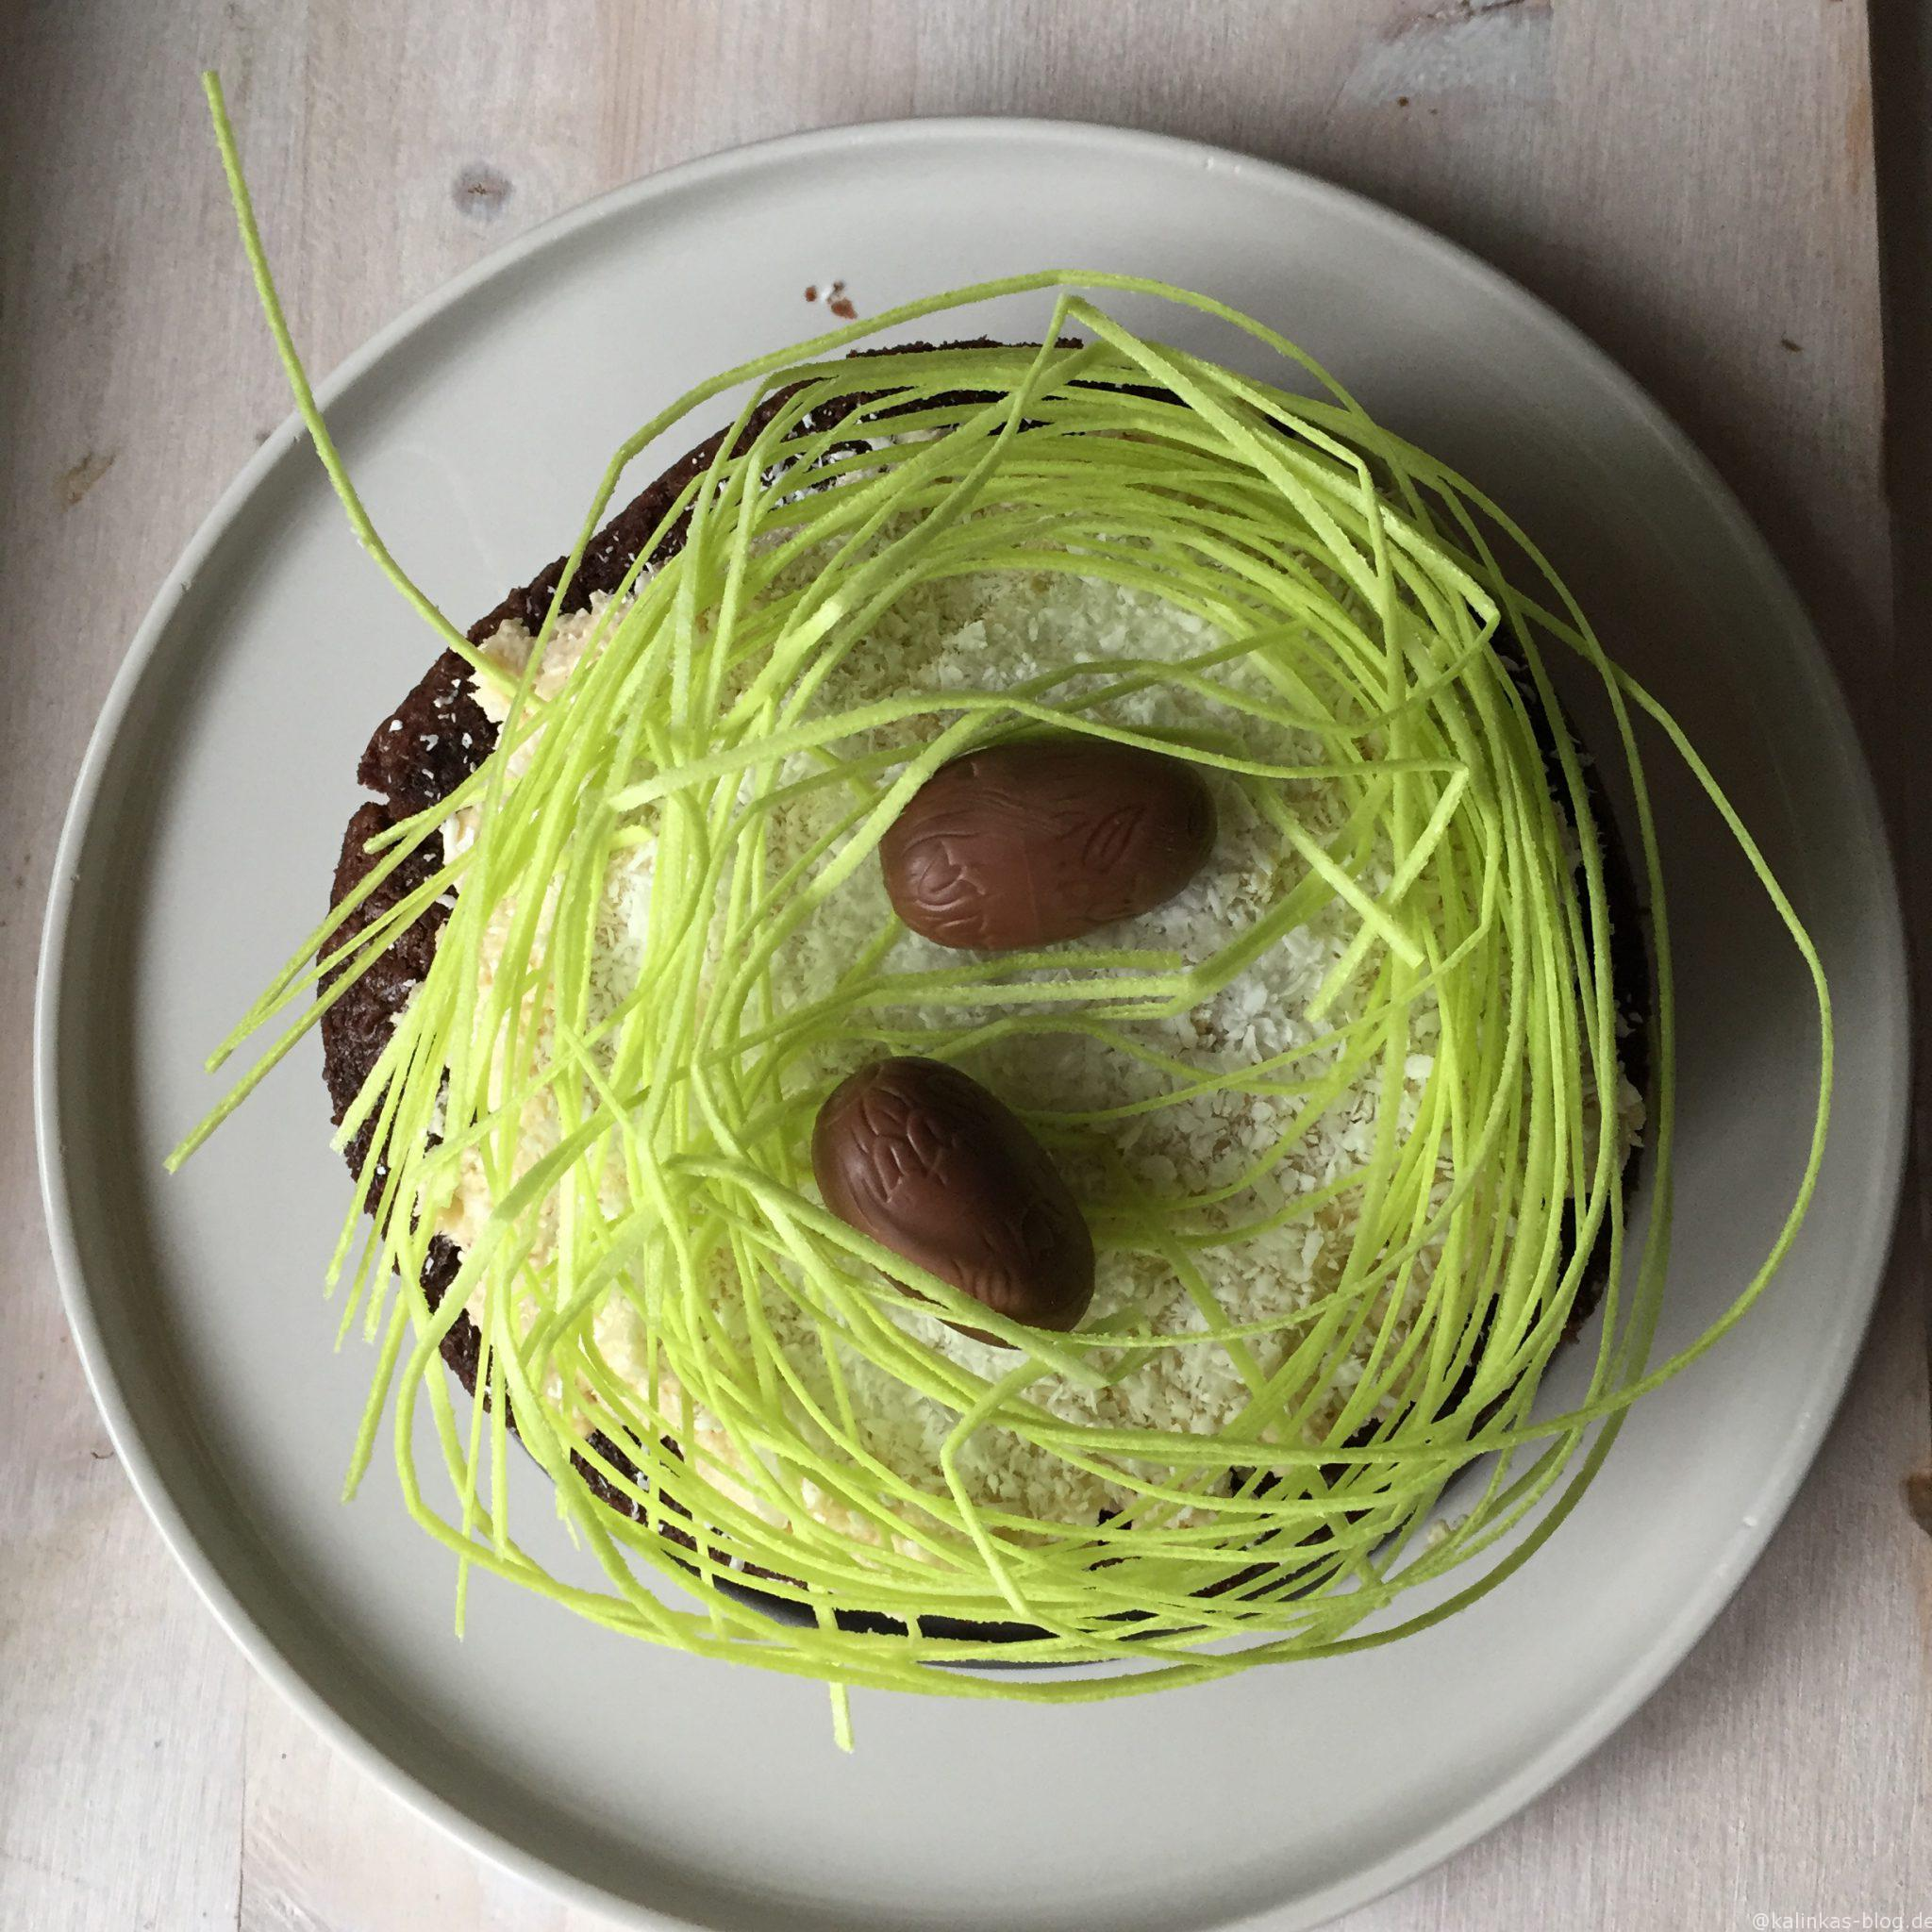 Kalinkas Küche | Kalinkas Küche Zucchini Salat Im Glas